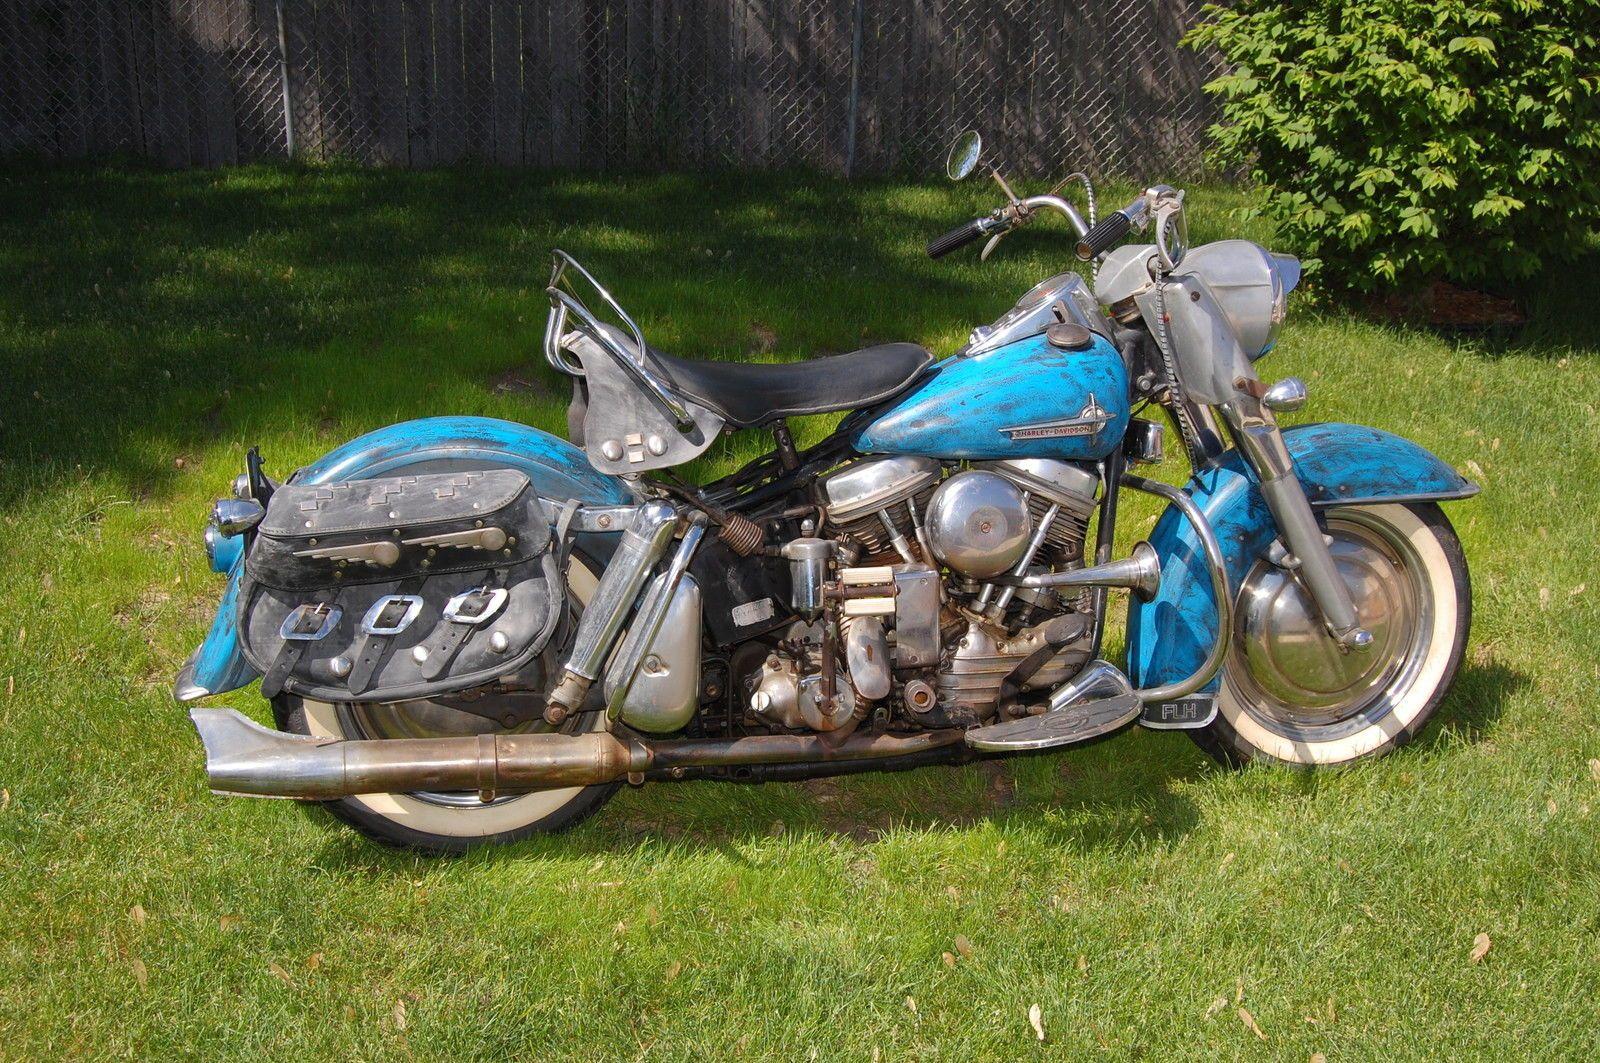 62 Panhead Duoglide Harley Davidson Model Harley Davidson Motorcycles Vintage Harley